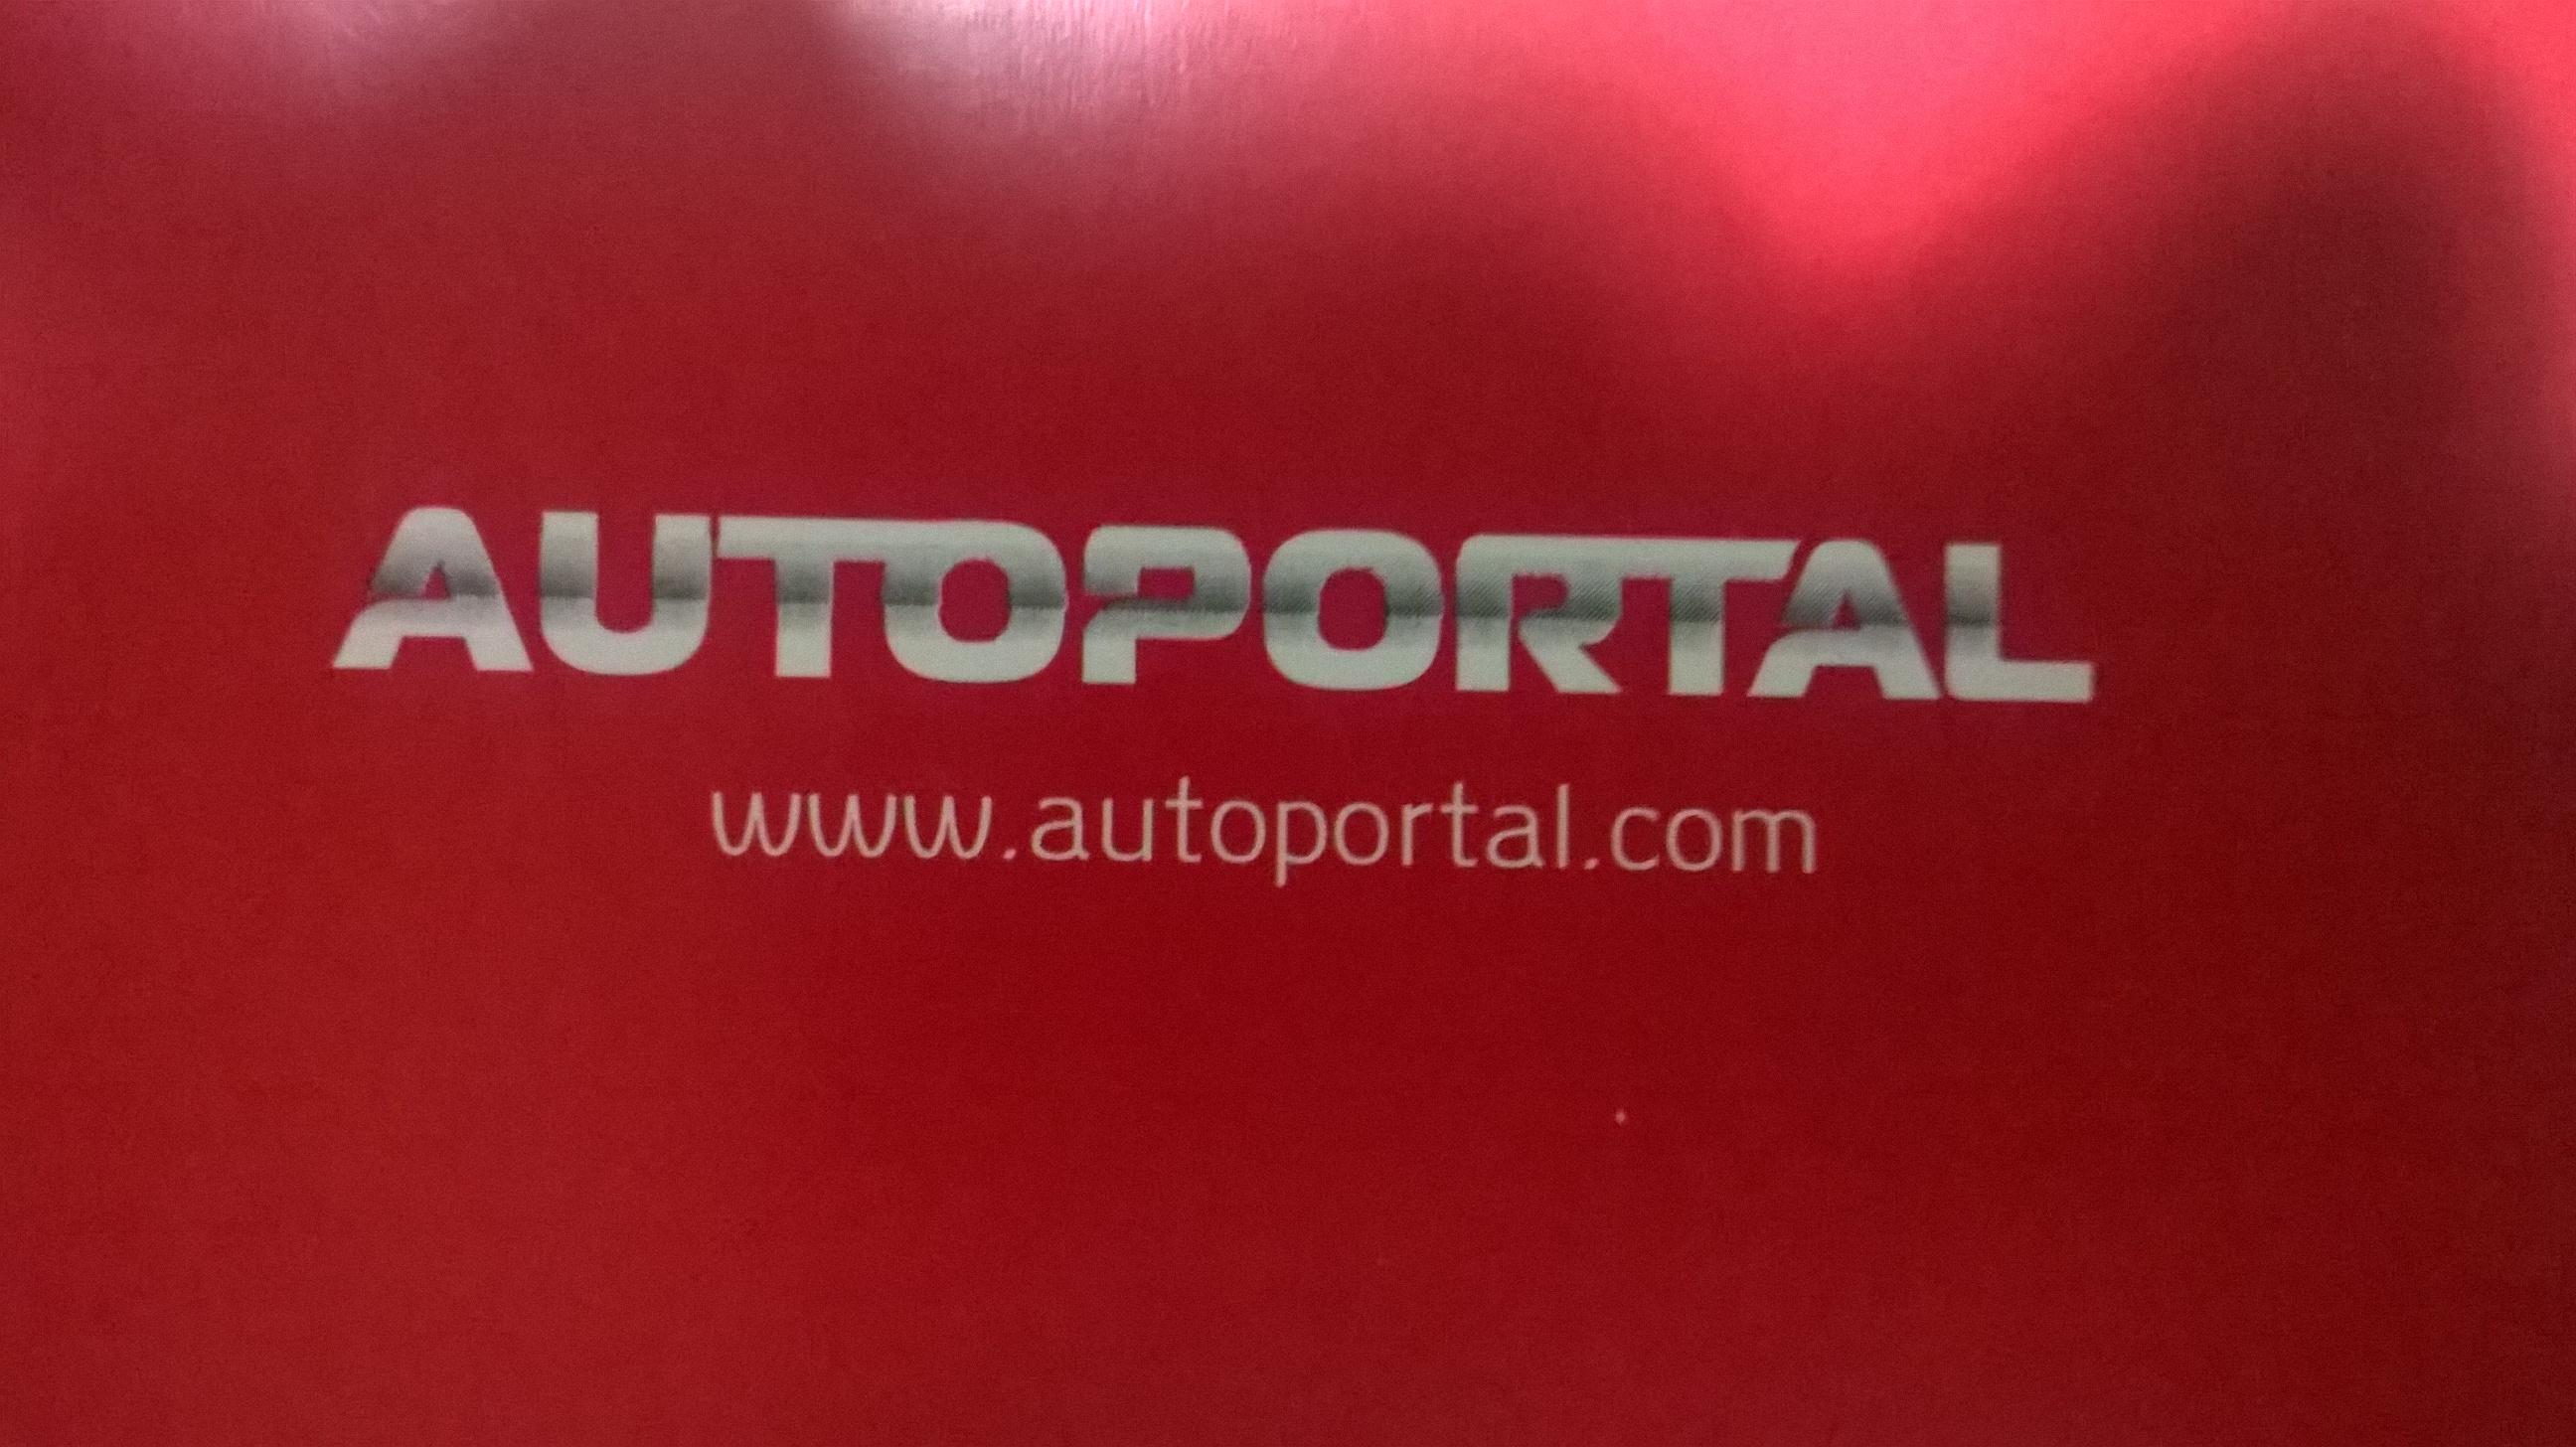 File:Autoportal Company.jpg - Wikimedia Commons